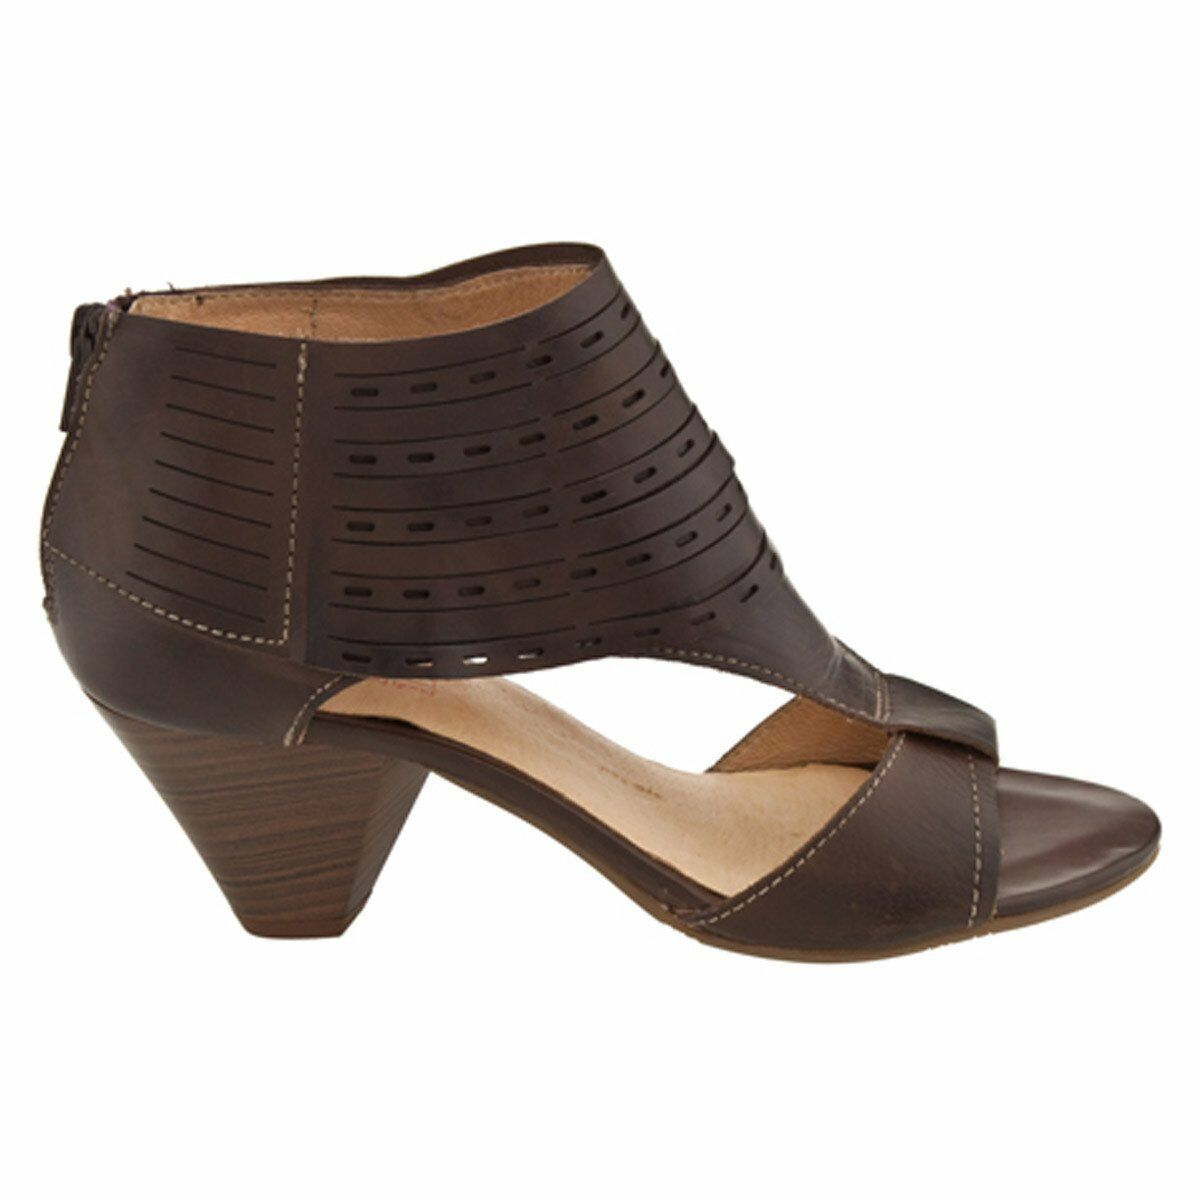 Pikolinos Olmo - Maracaivo braun Cut-Out Sandal